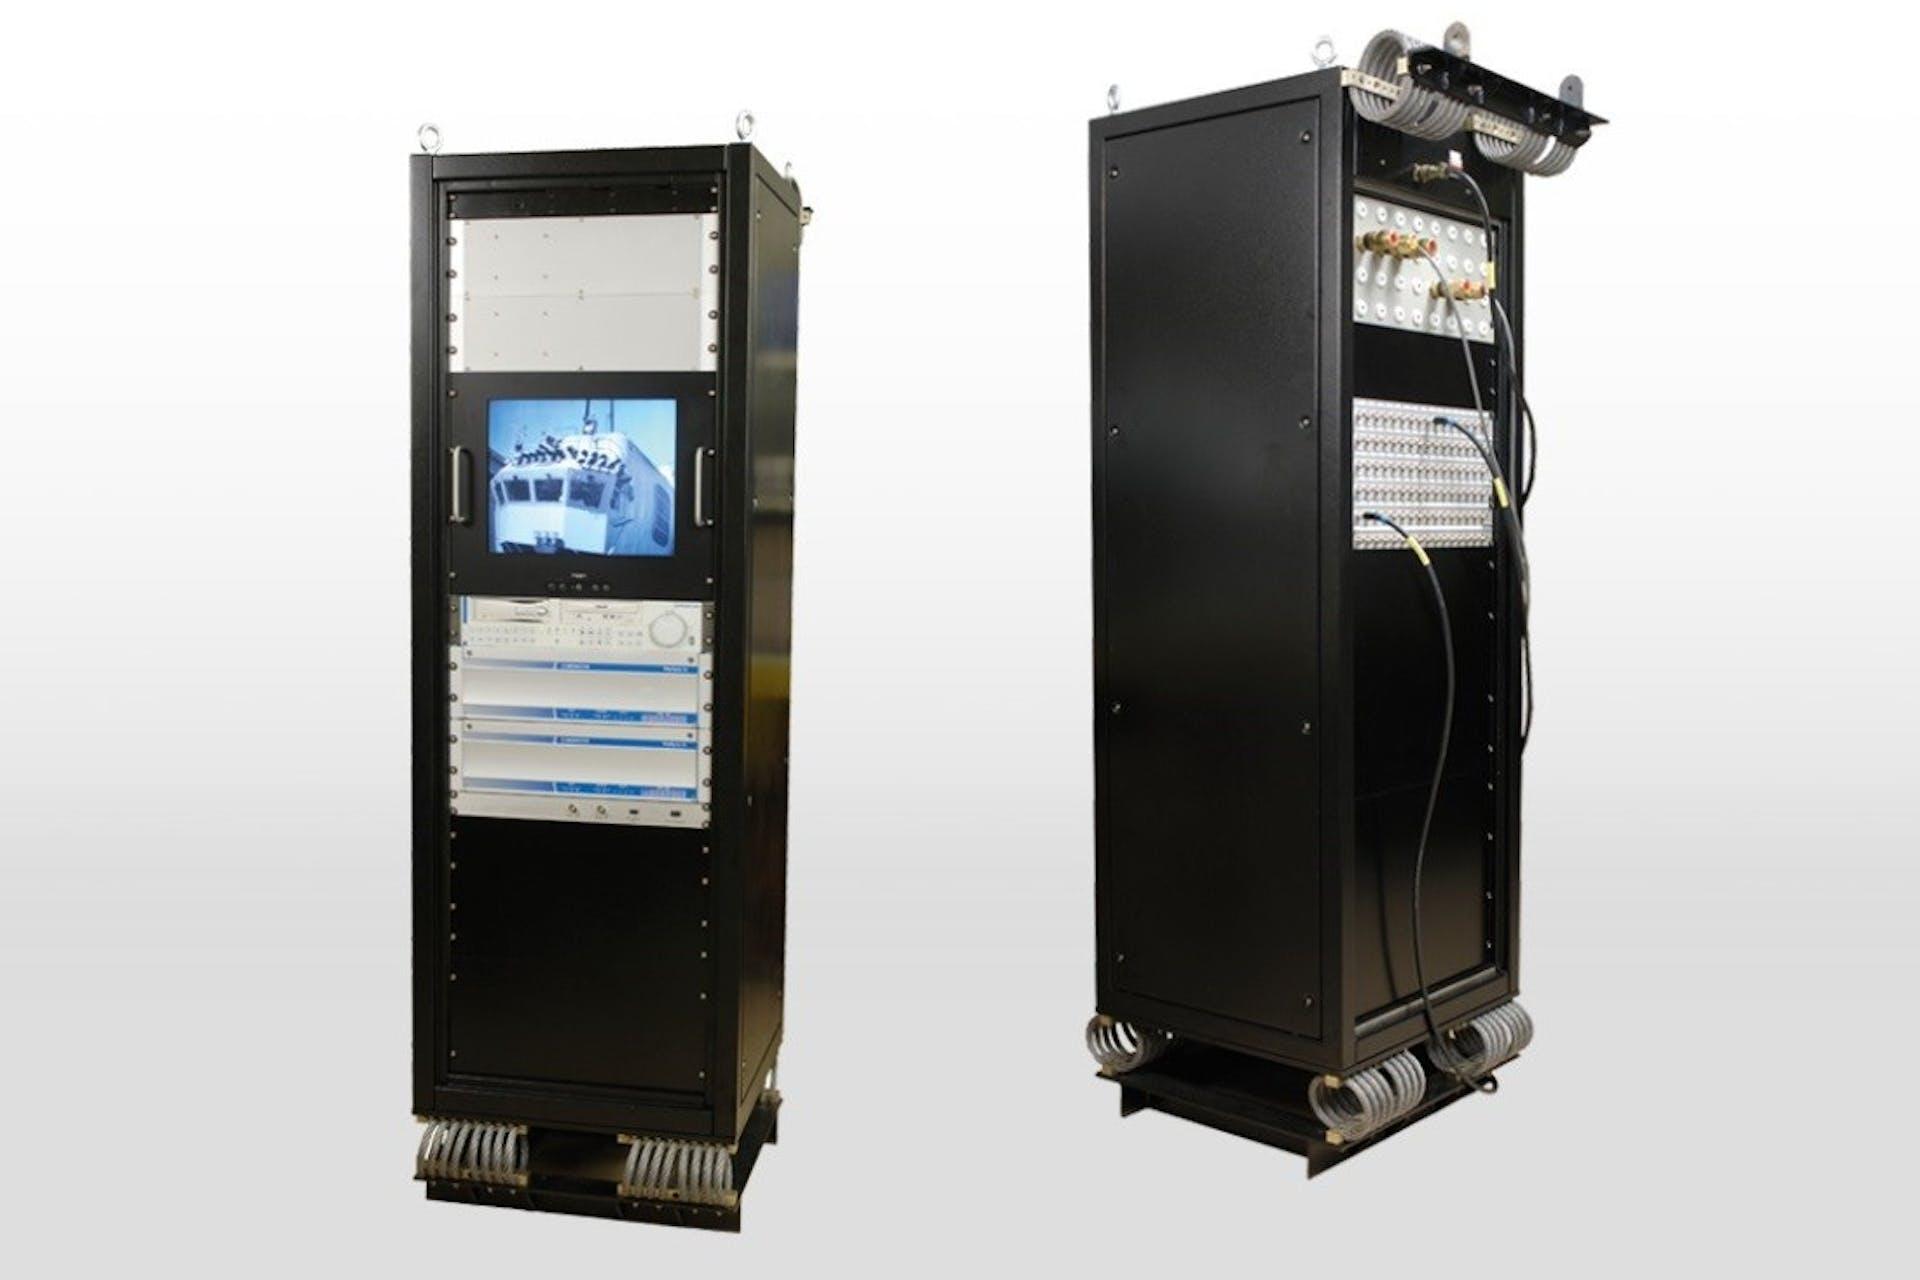 Amphibious-Low-Light-Surveillance-System-MCU-Rack-005